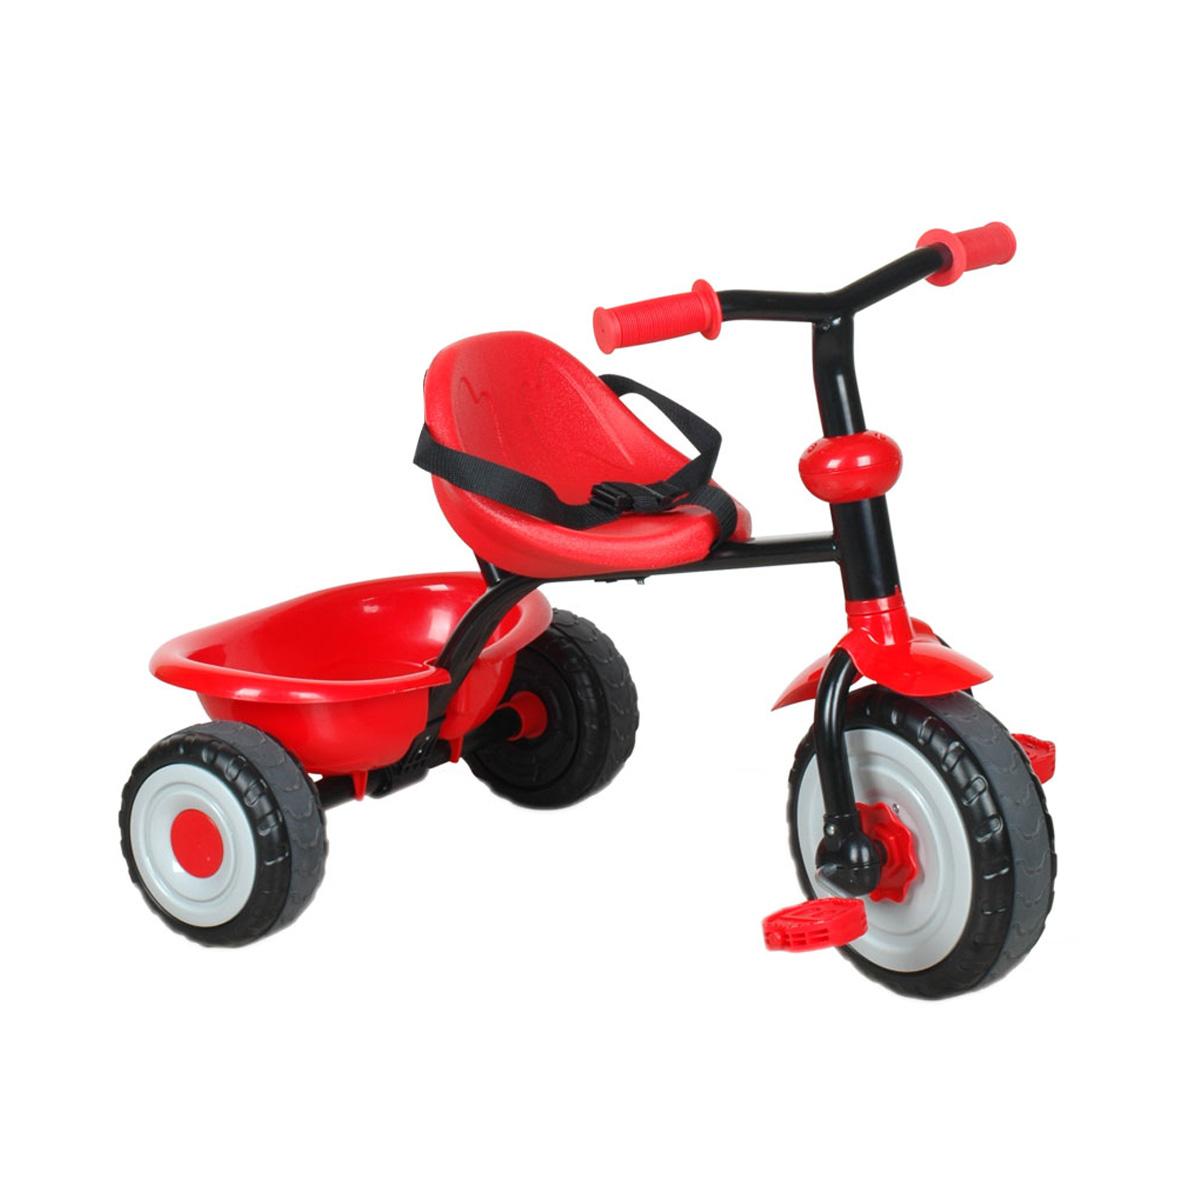 trikestar trike with handle bike children 39 s tricycle 3. Black Bedroom Furniture Sets. Home Design Ideas